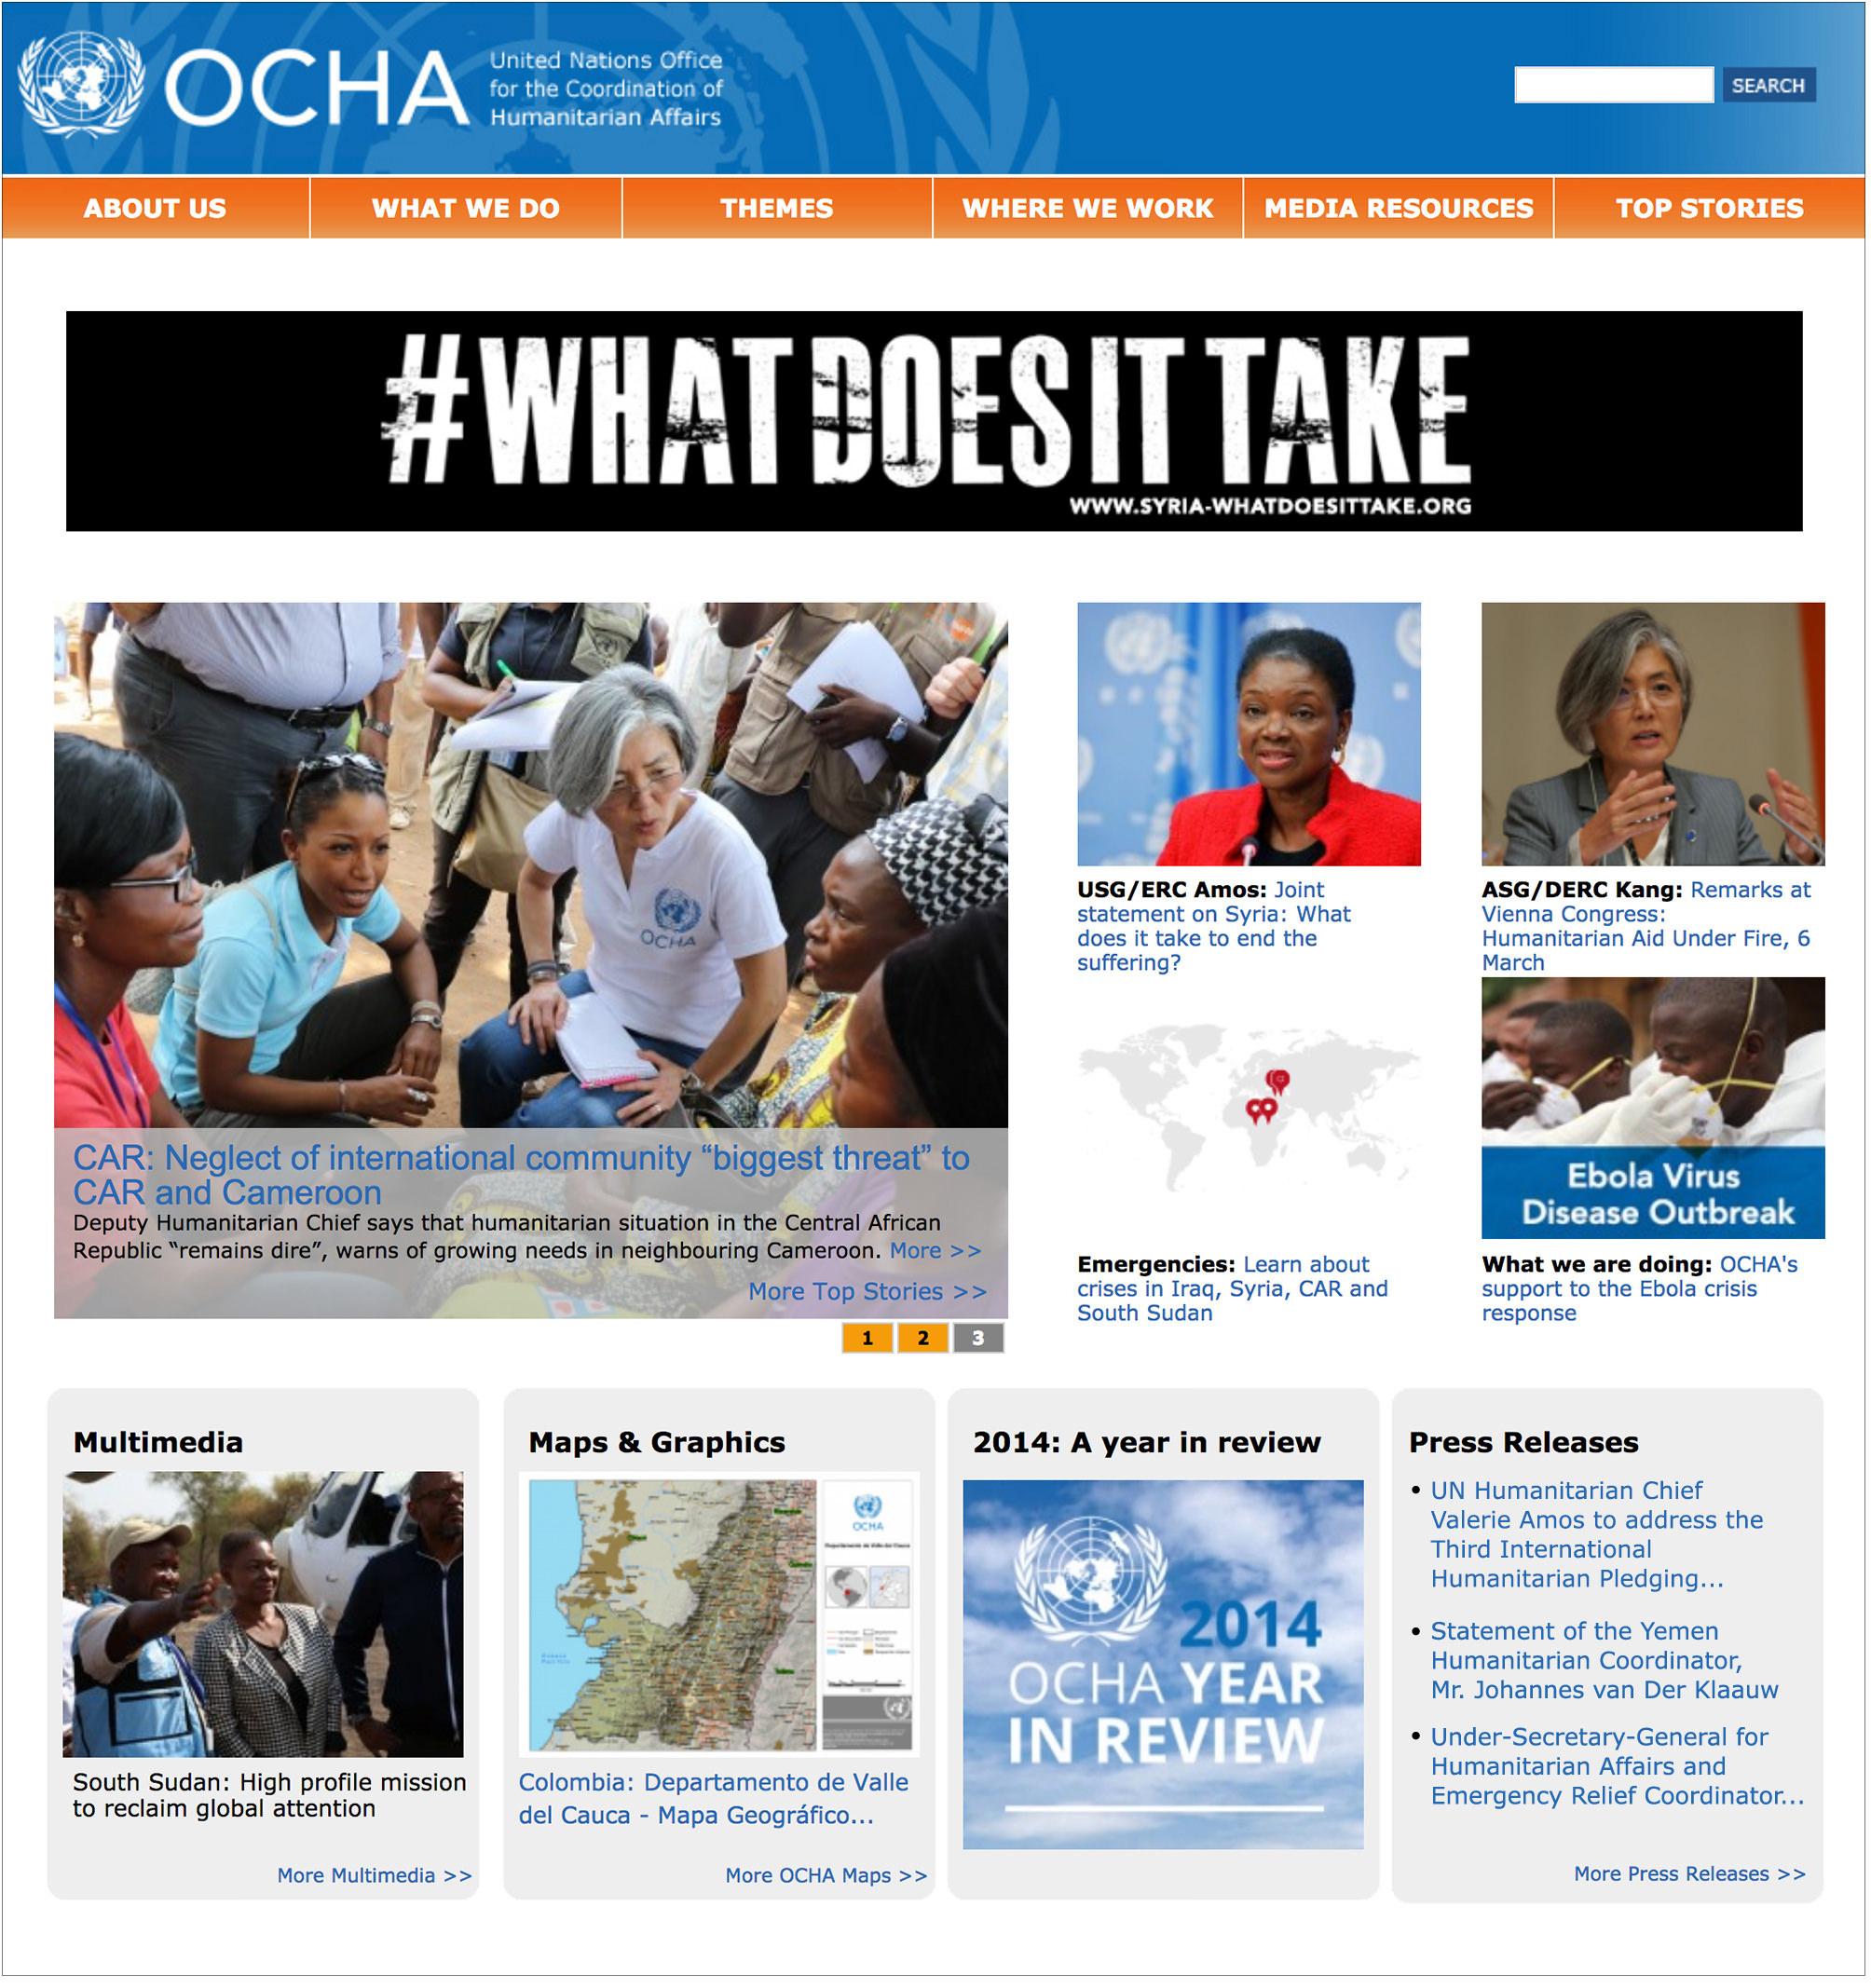 unocha-homepage-whatdoesittake.jpg